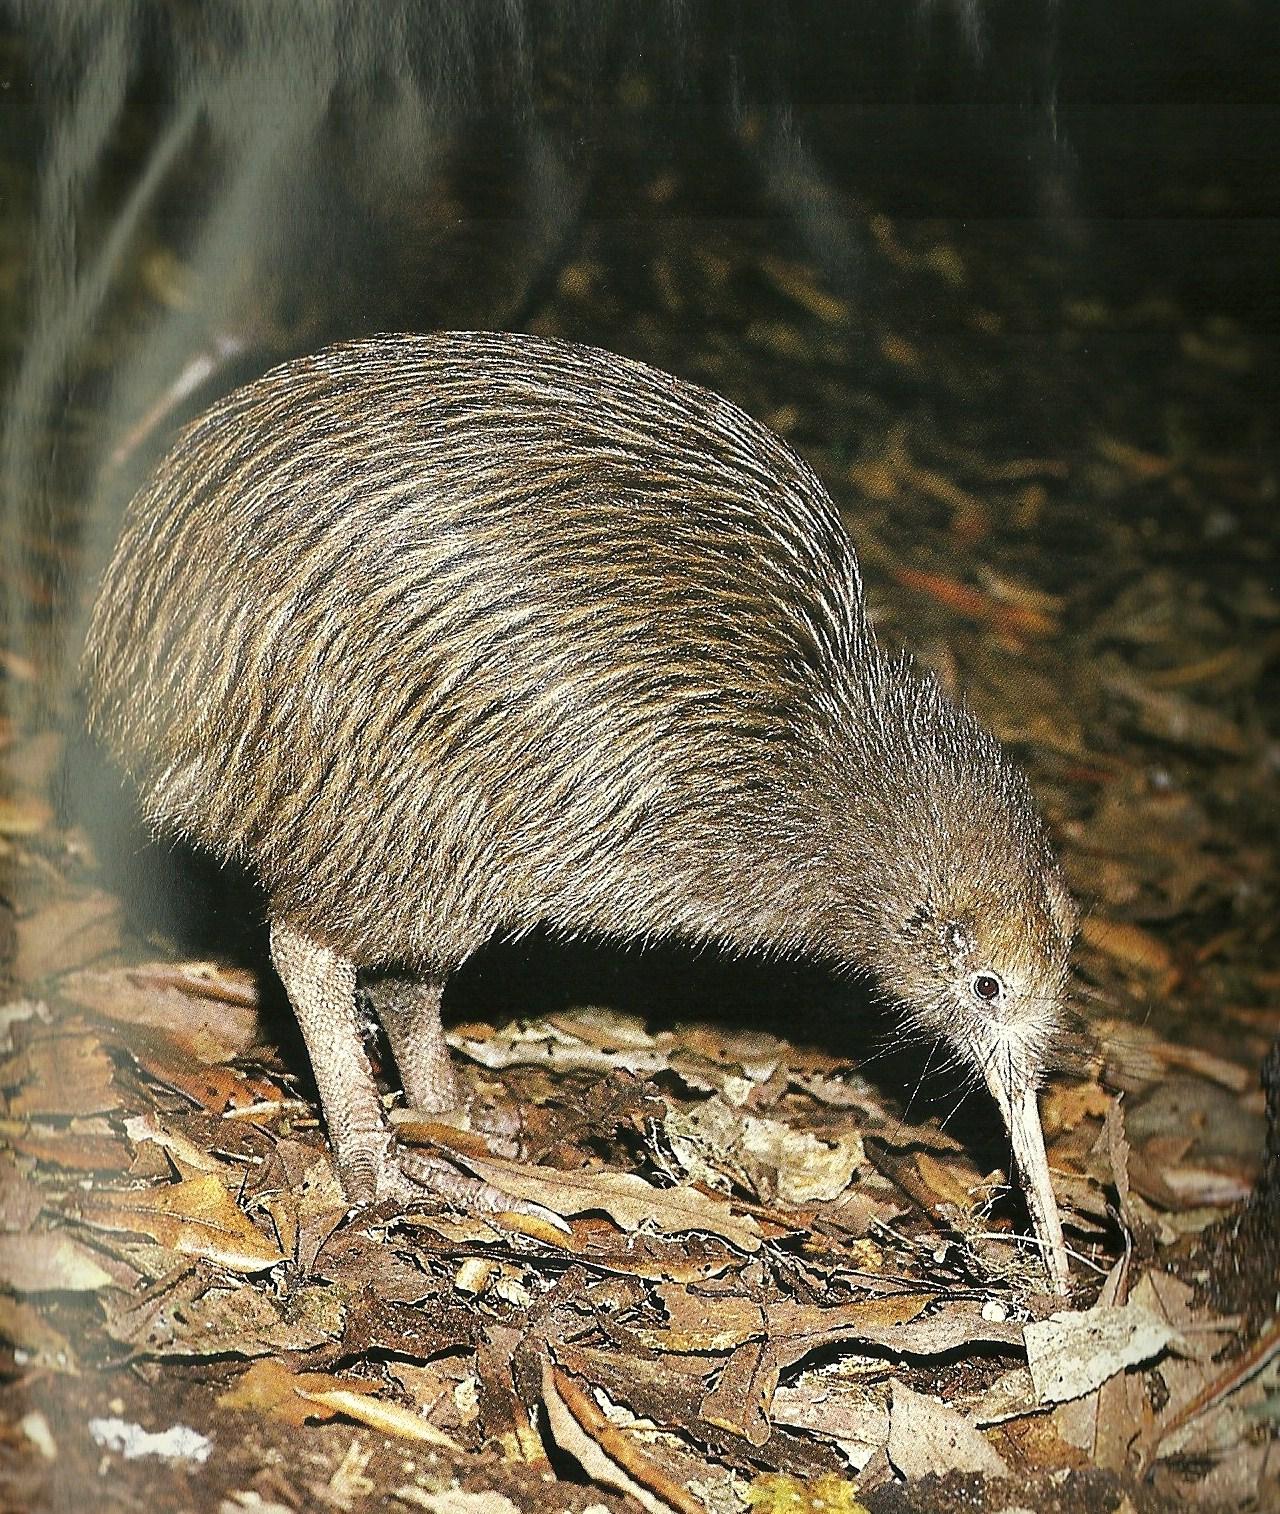 A real kiwi